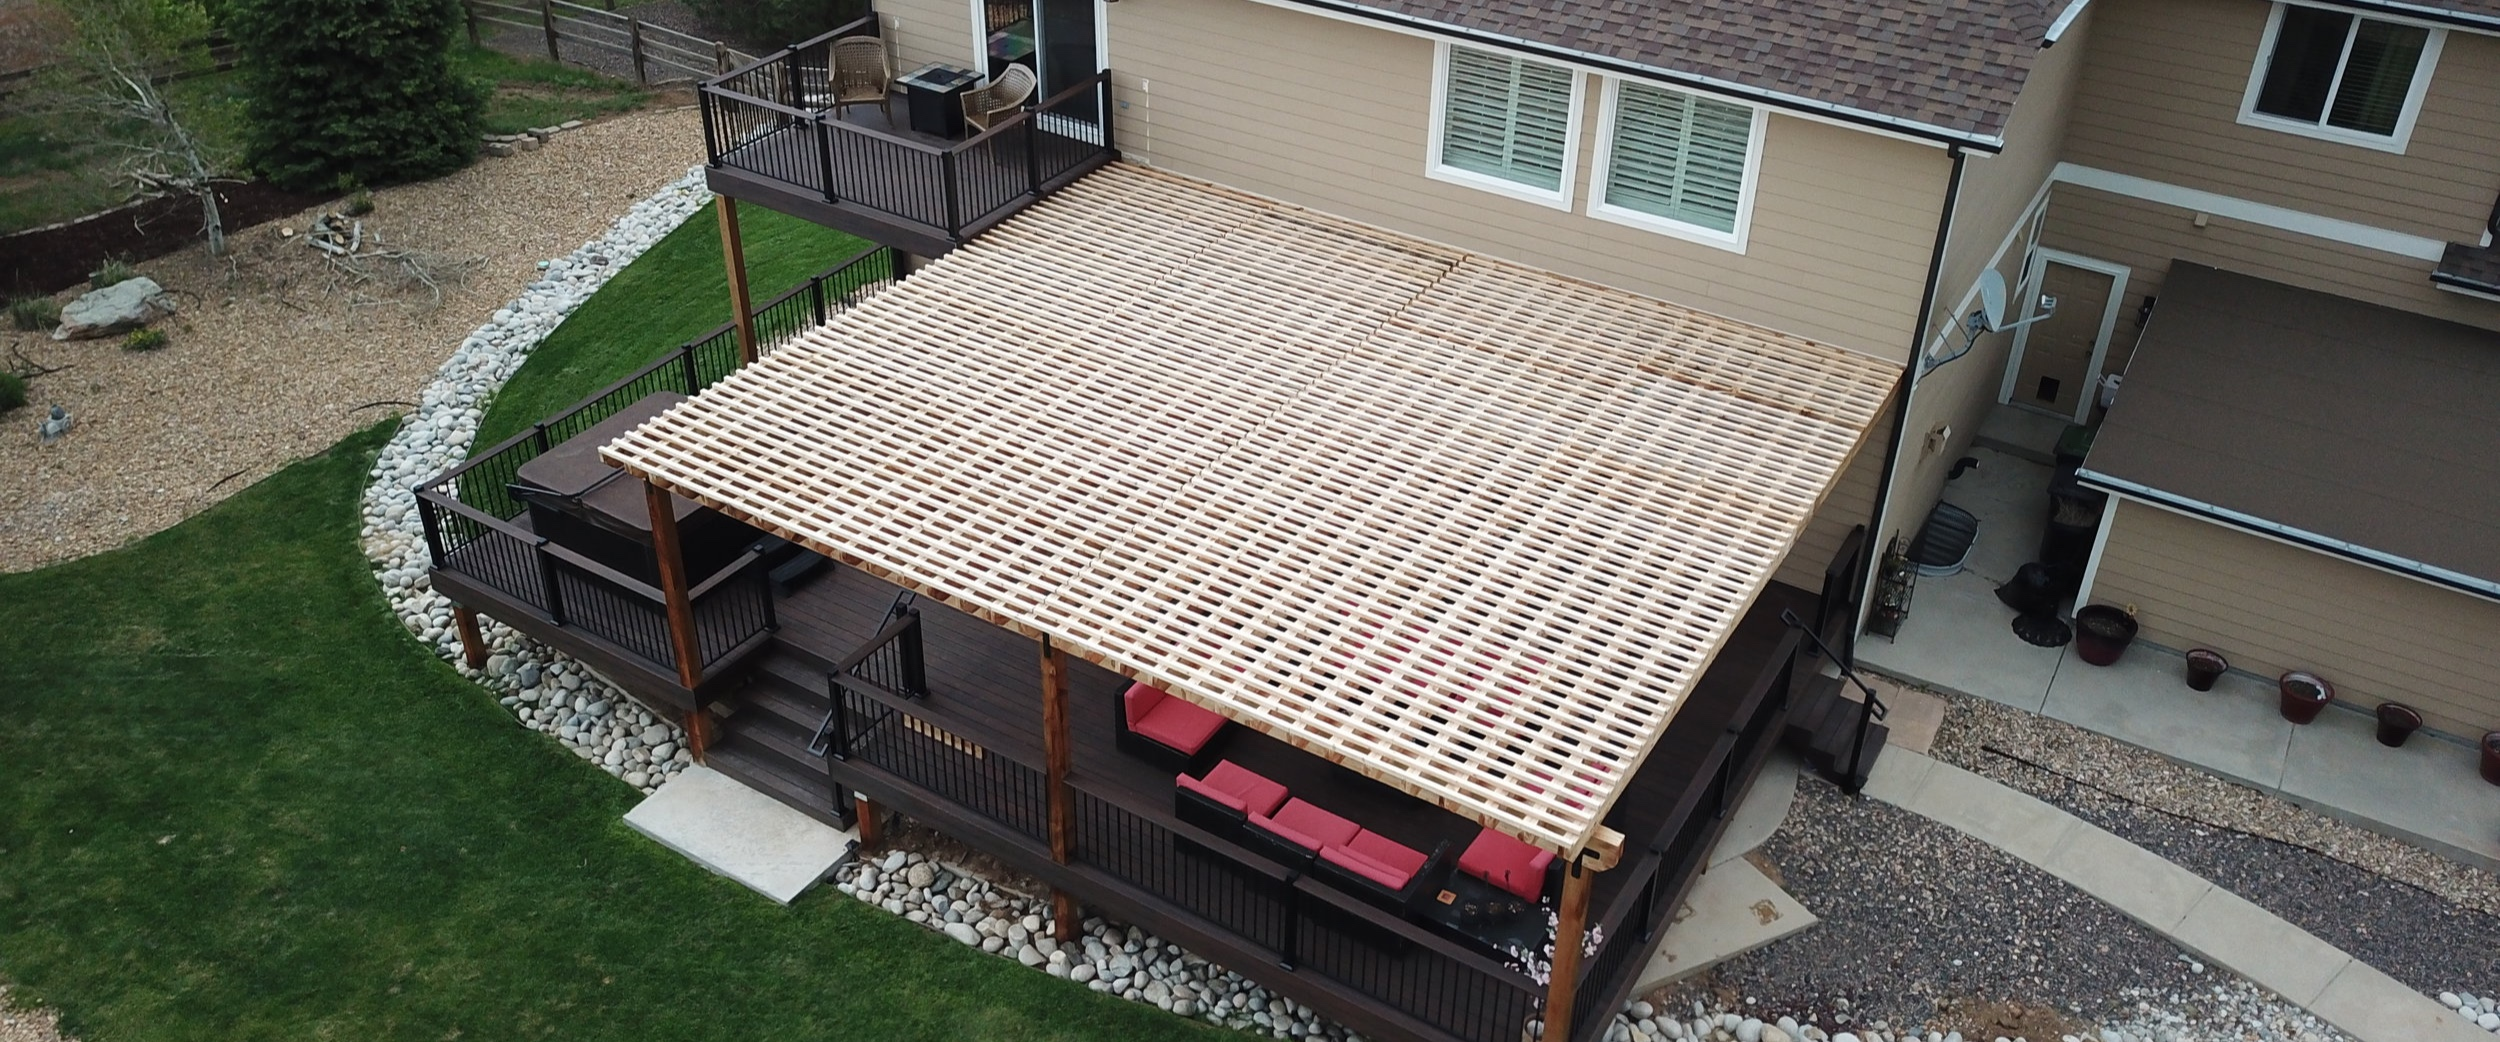 patio covers denver deck builders